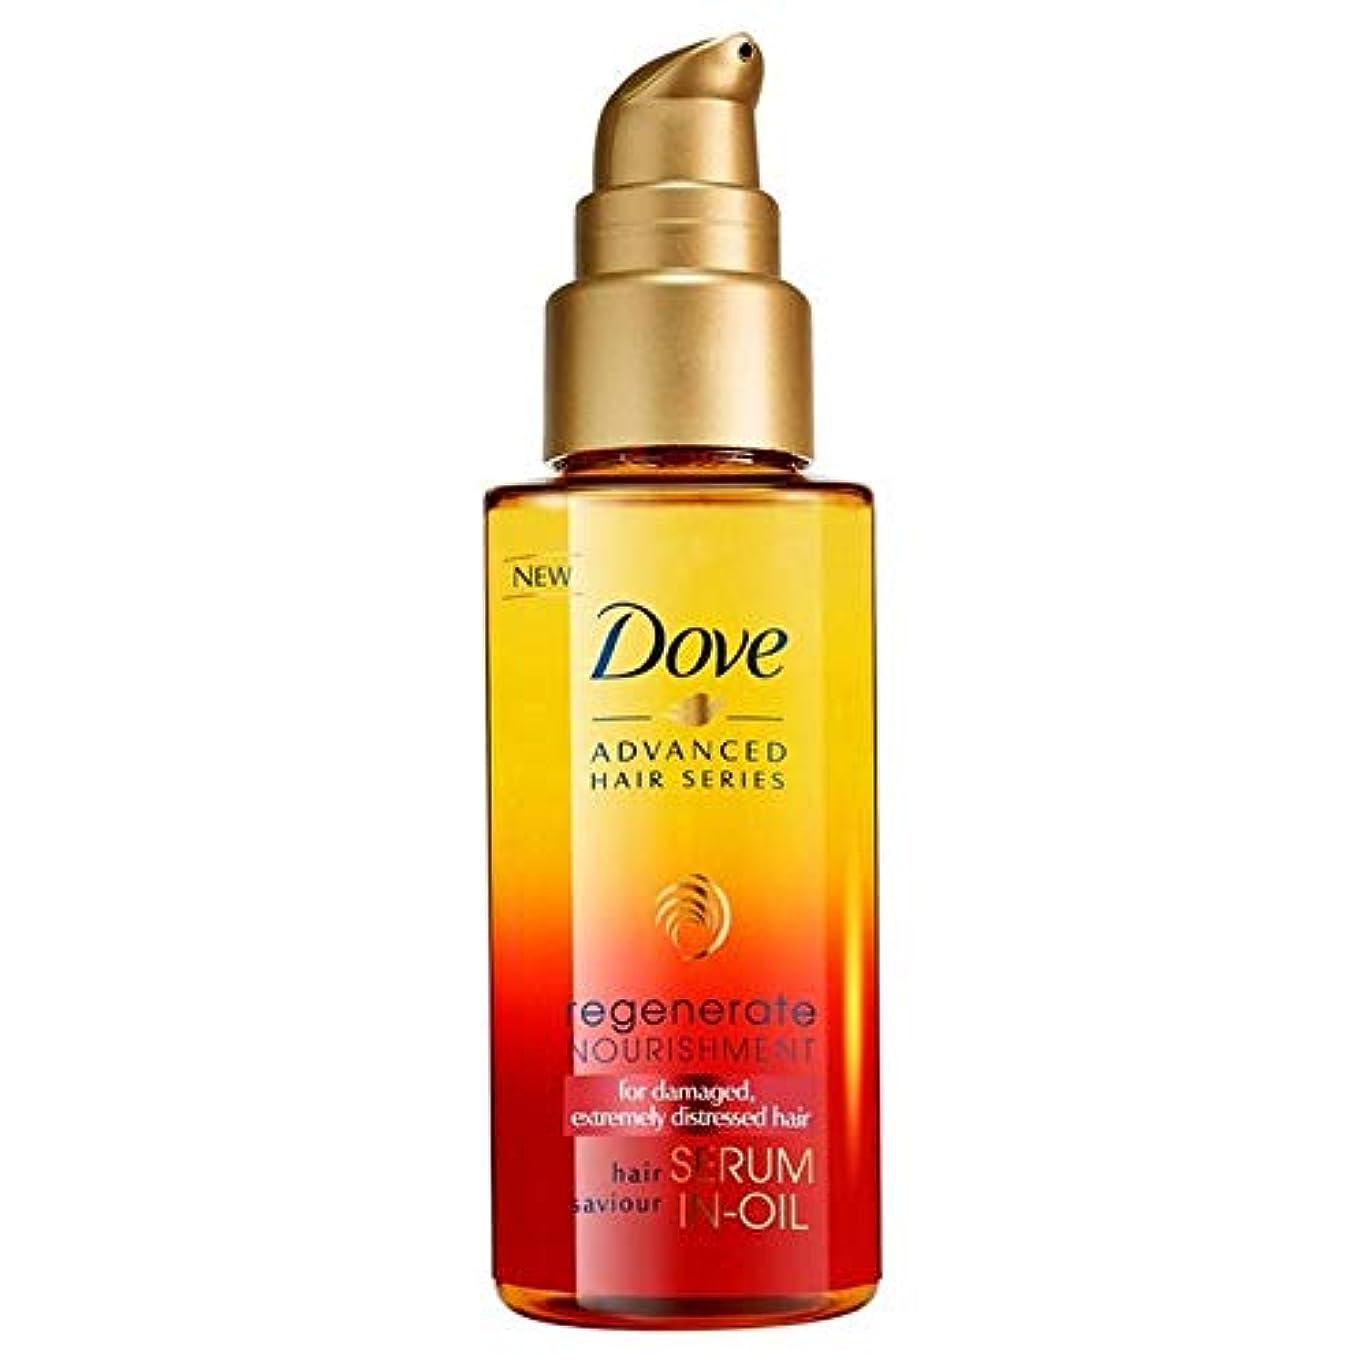 [Dove ] 鳩高度な髪シリーズは栄養血清中の油中50ミリリットルを再生成します - Dove Advanced Hair Series Regenerate Nourishment Serum-in-Oil 50ml...